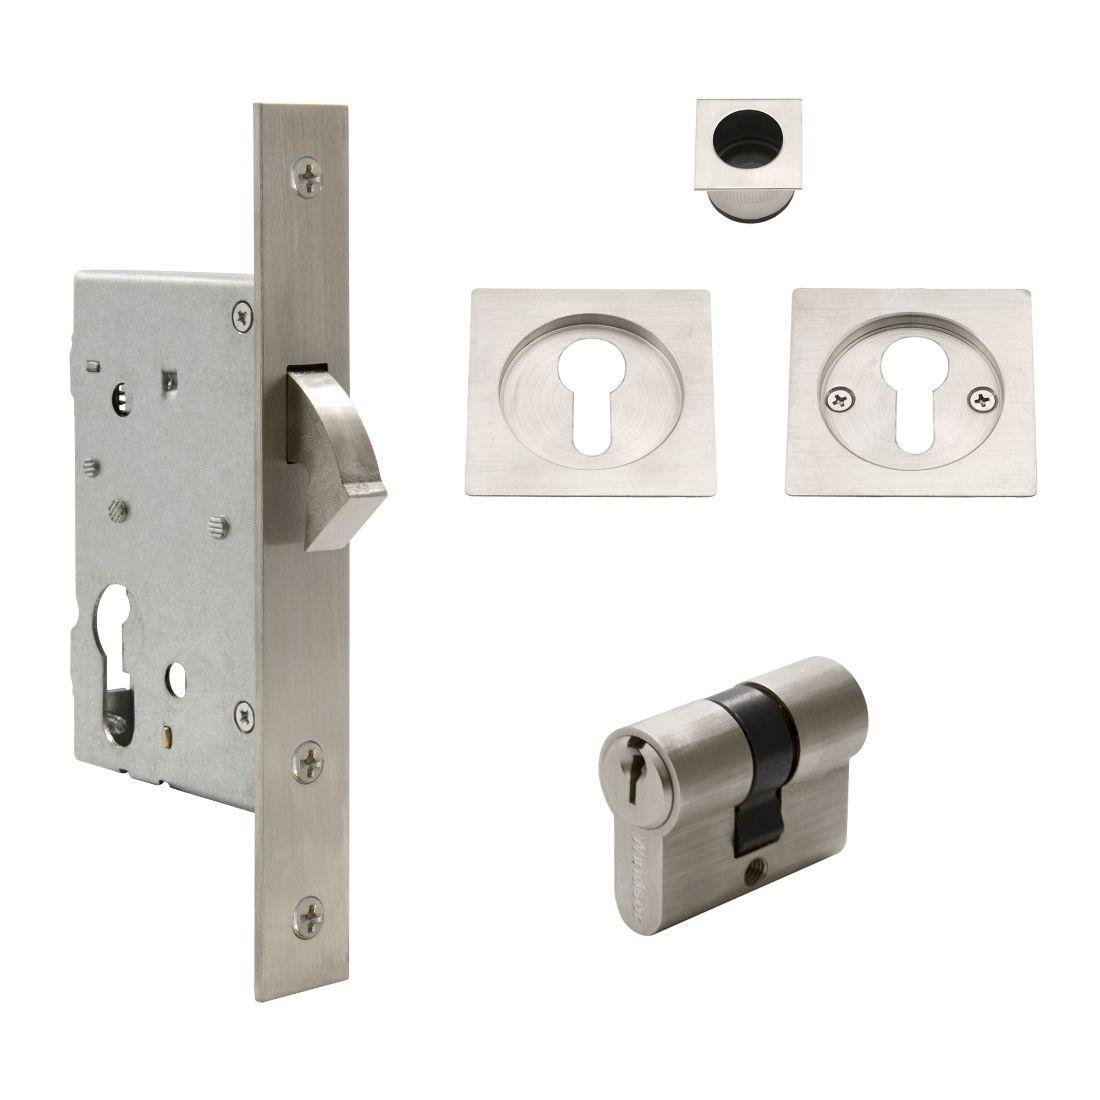 CavitySuite Locking Kit Square Stainless Steel